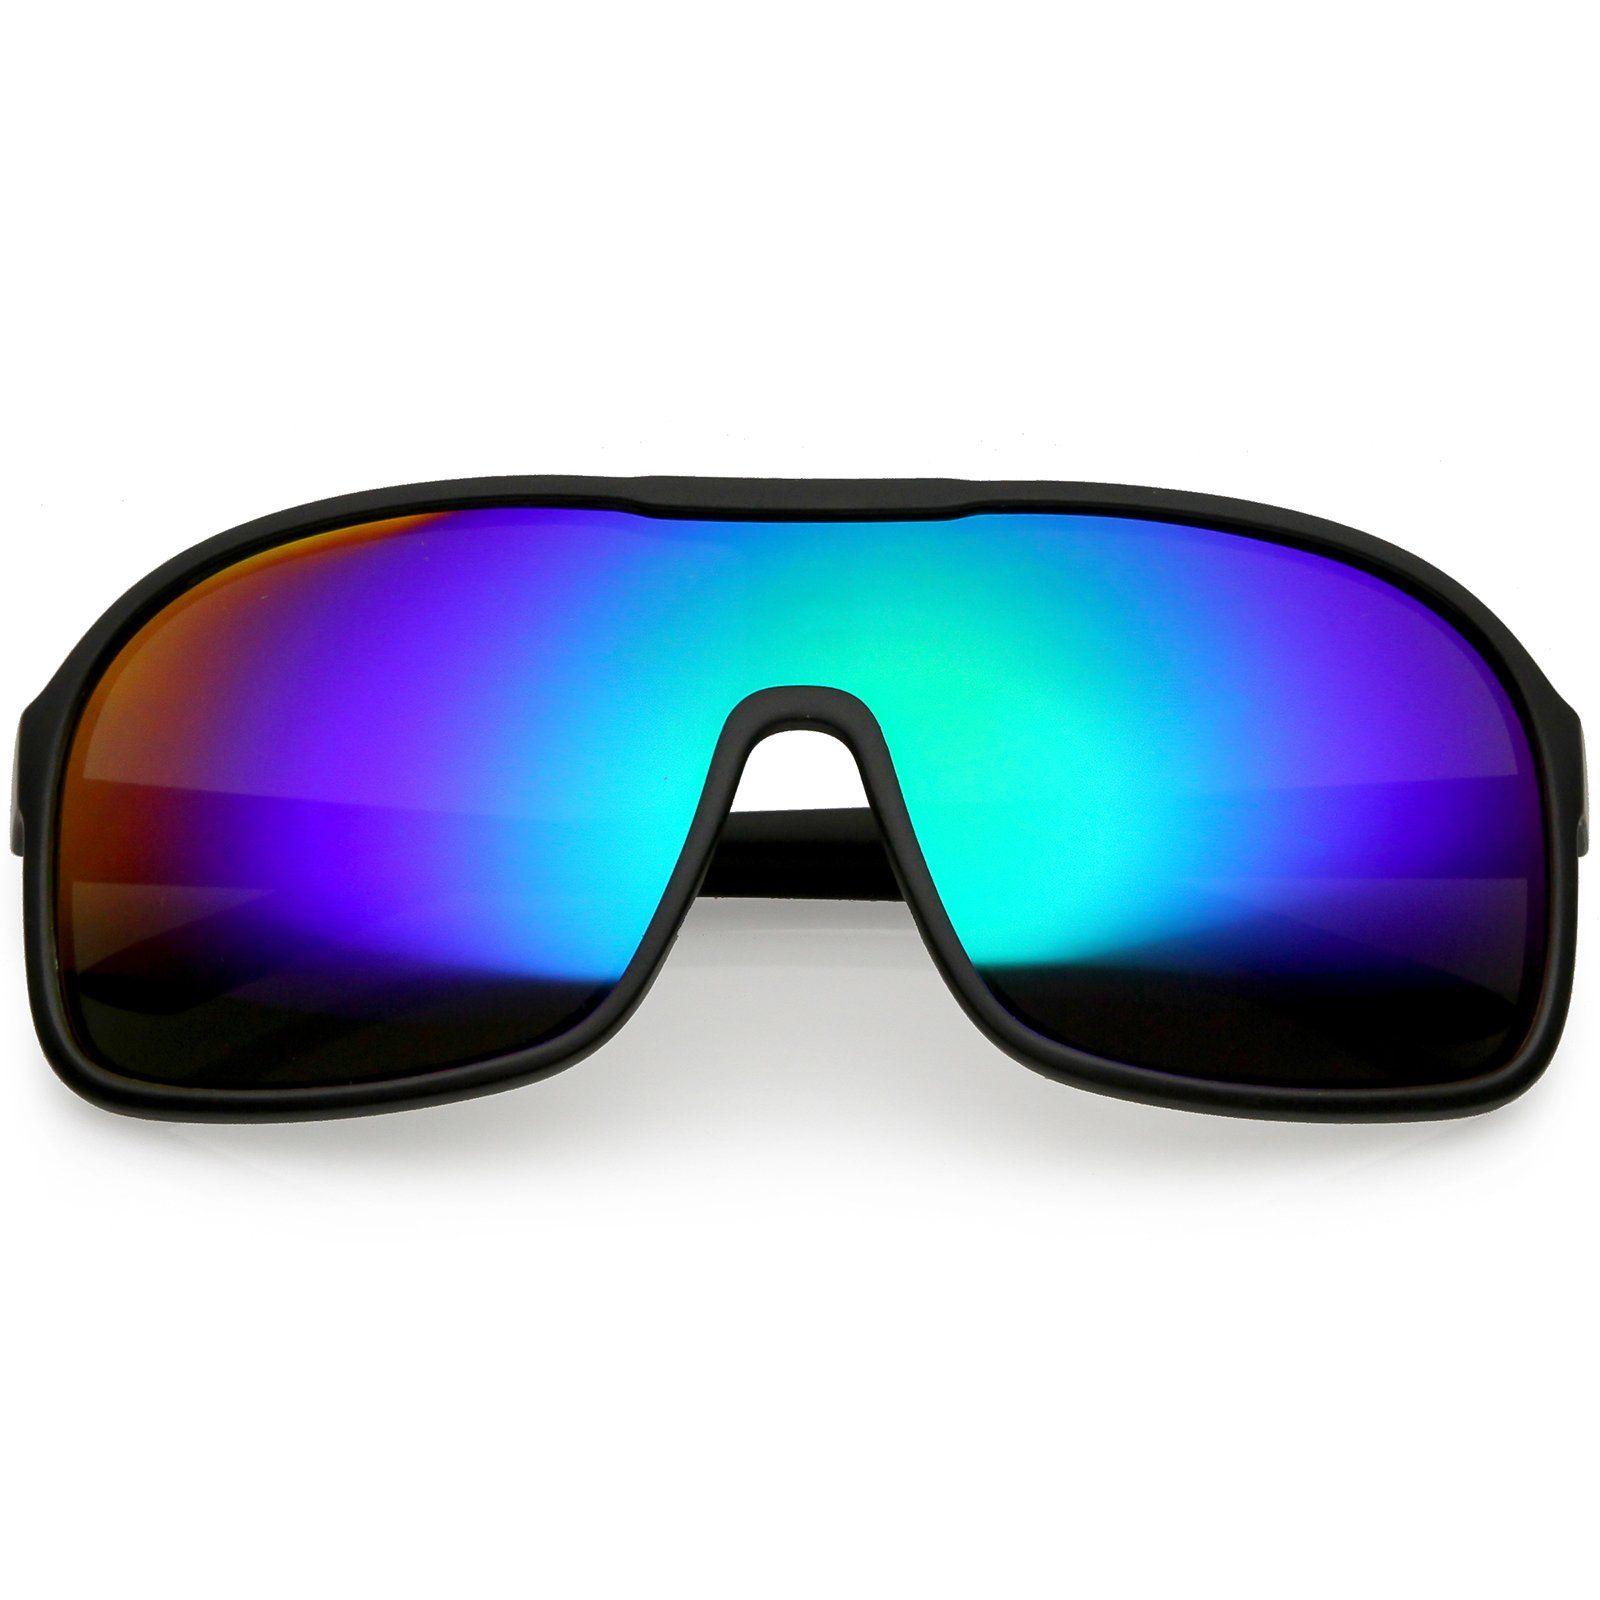 41d3b617ac Oversize Flat Top Sporty Shield Sunglasses Color Mirrored Lens 63mm  frame   sunglasses  sunglass  mirrored  cateye  summer  bold  womens  purple   oversized